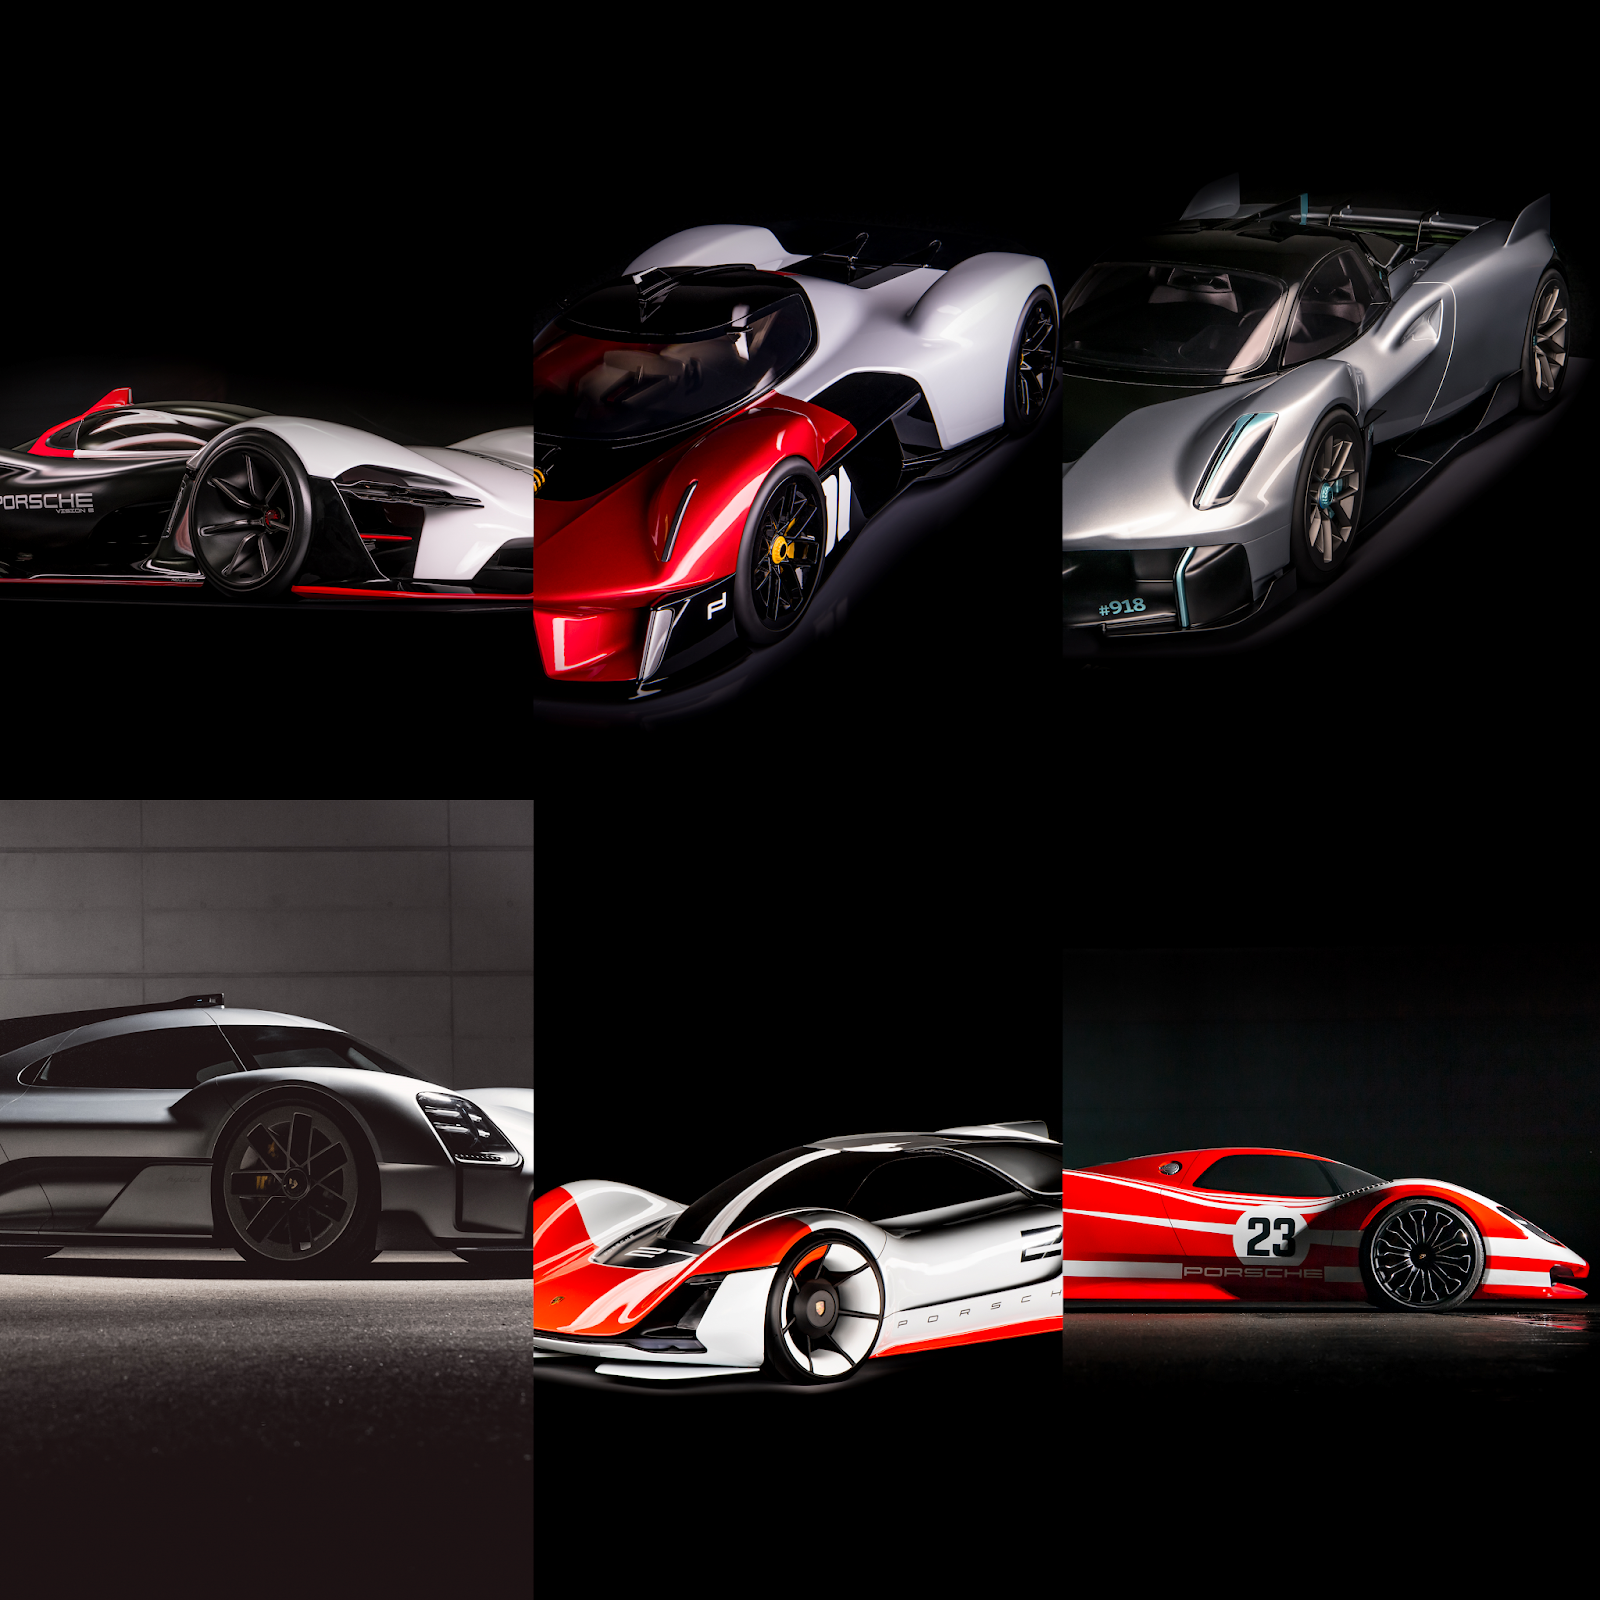 collage 1 Τα άγνωστα Hypercars της Porsche